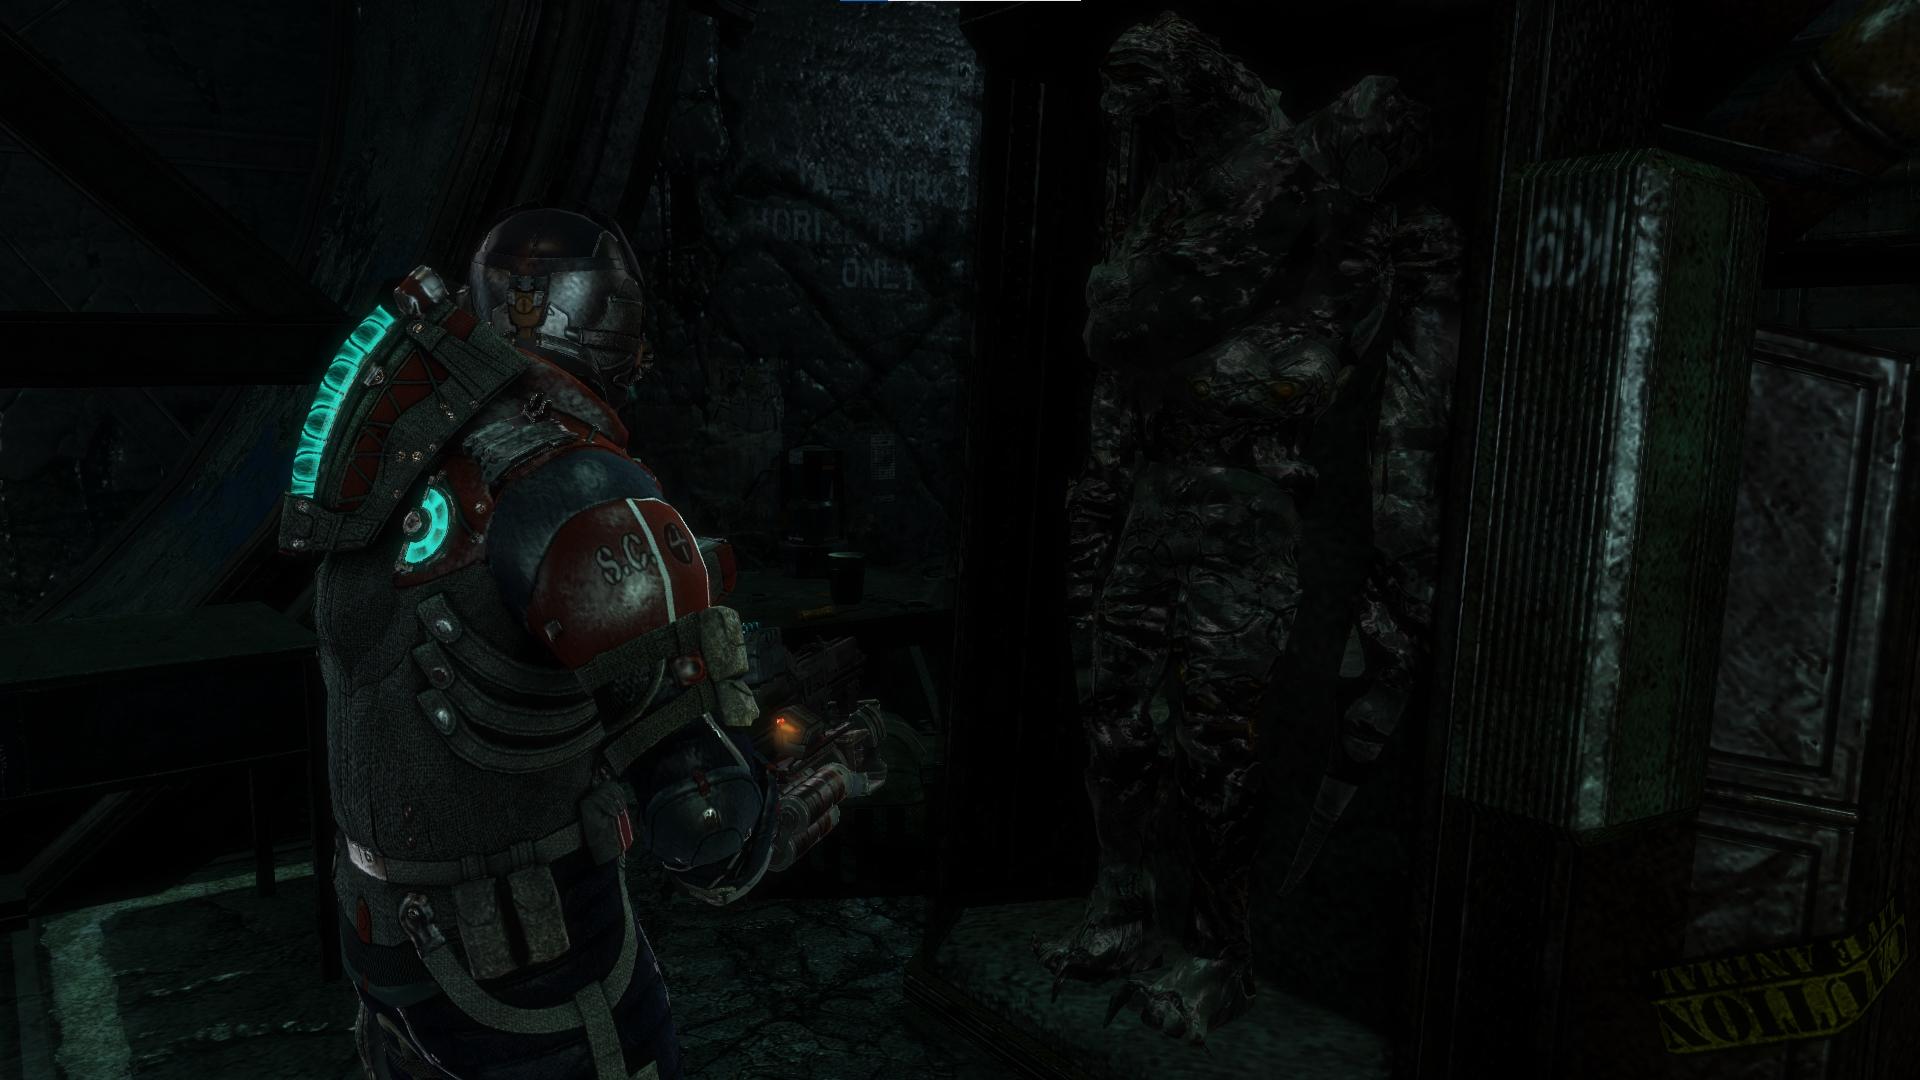 File:The Hunter Dead Space 3.jpg